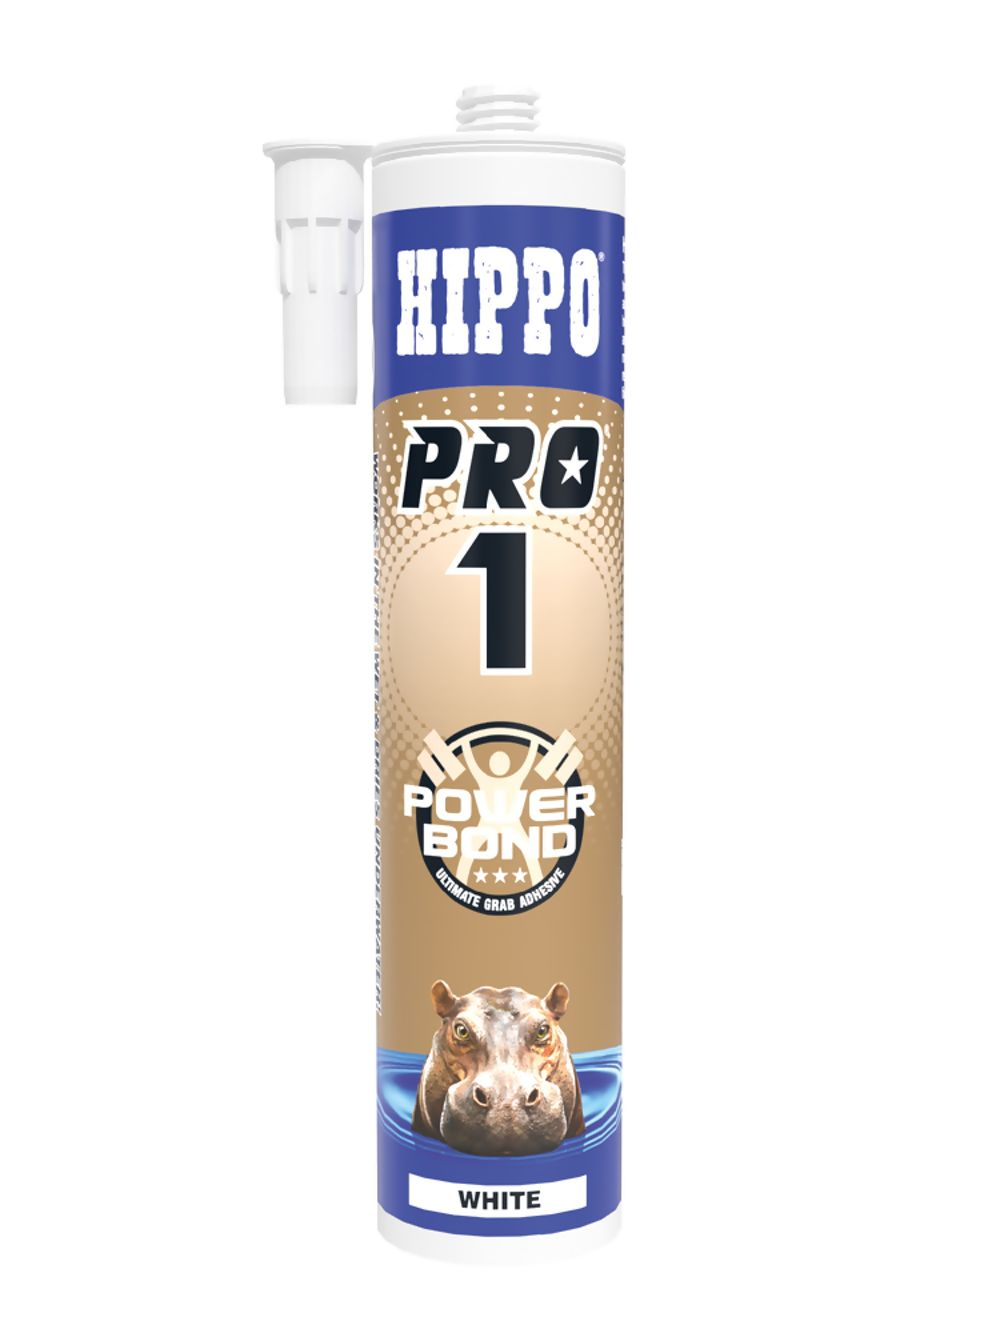 Hippo Pro 1 Power Bond Ultimate Grab Adhesive 310ml Ref H18508.